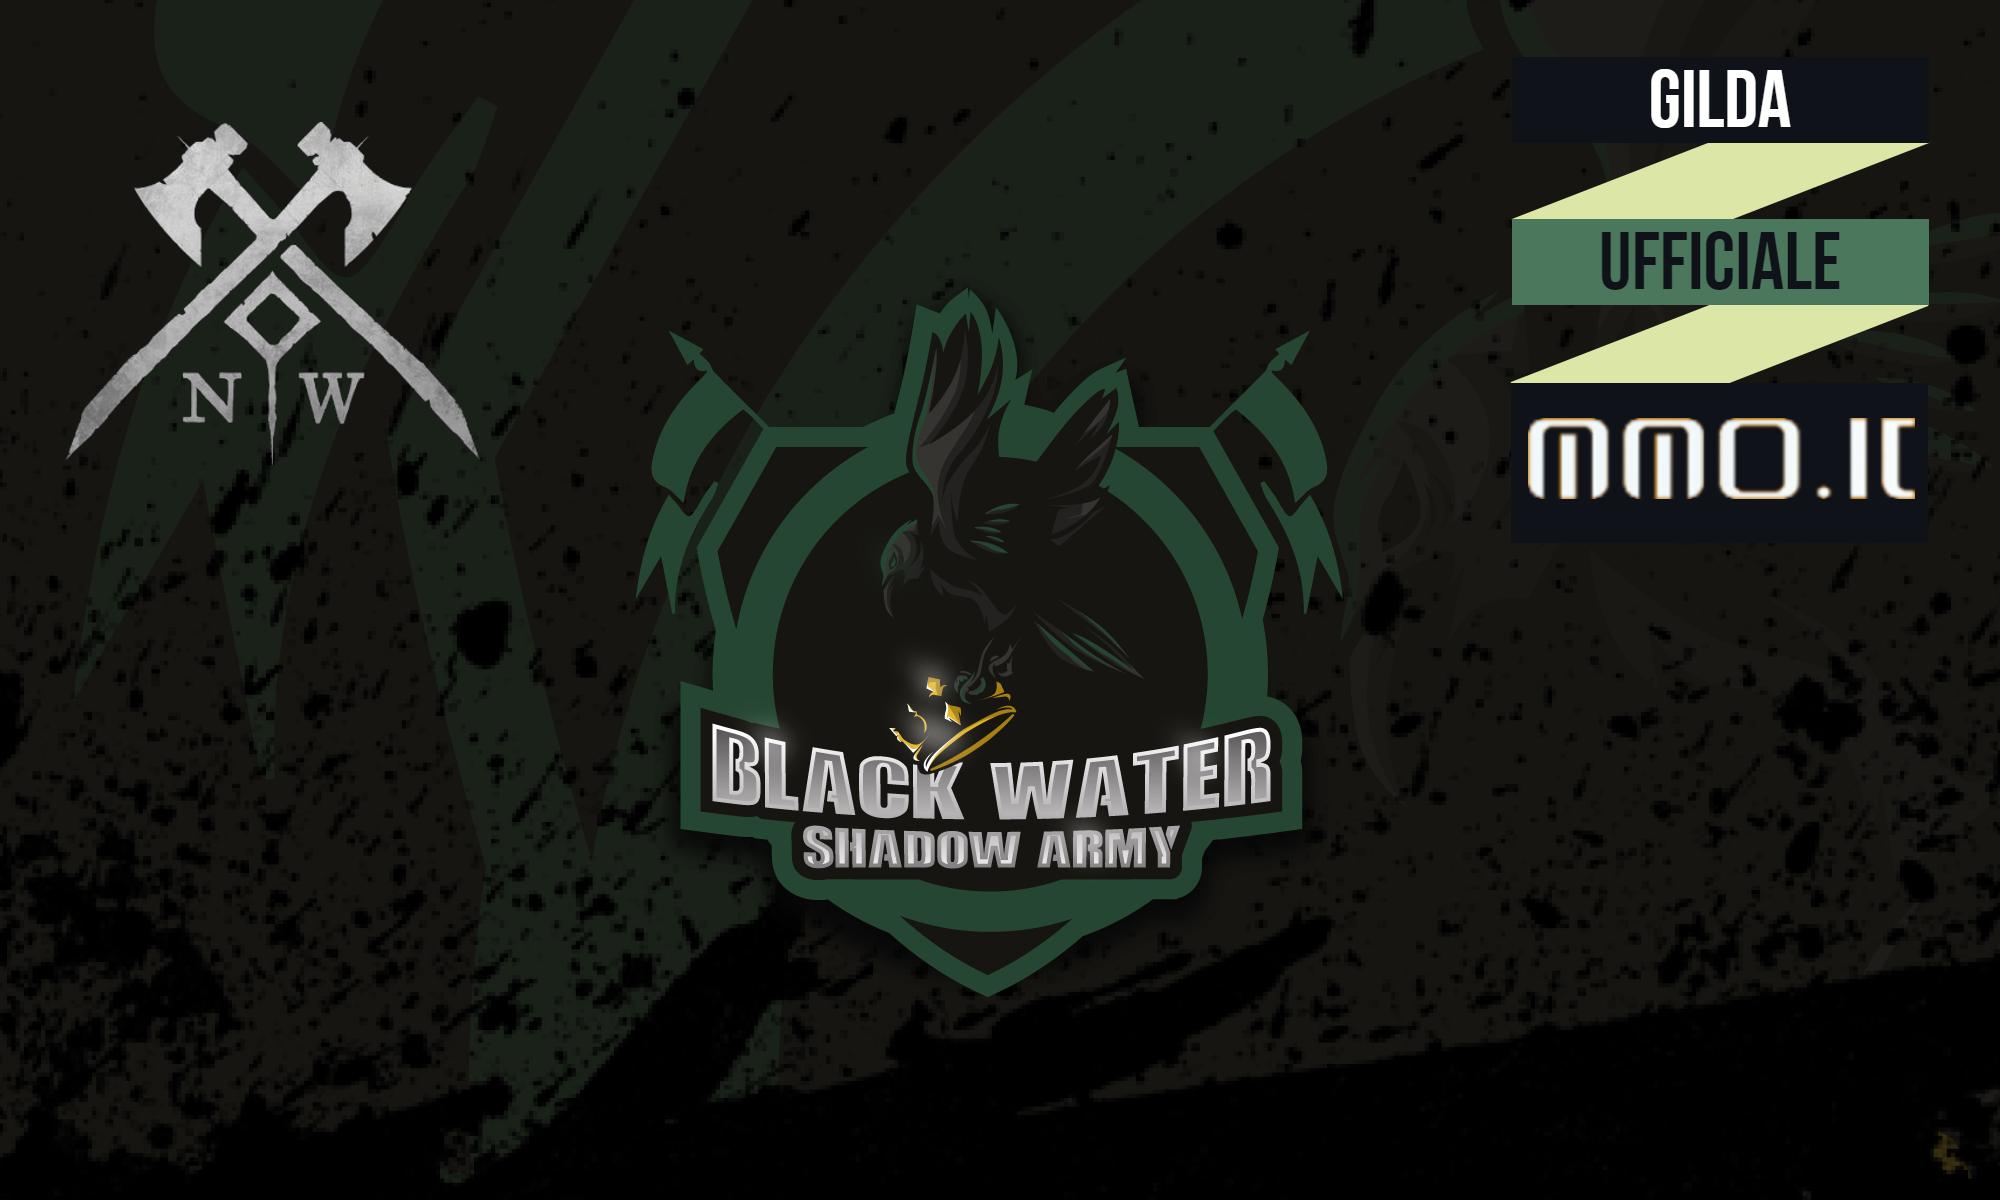 new world Blackwater Shadow Army gilda ufficiale new world italia